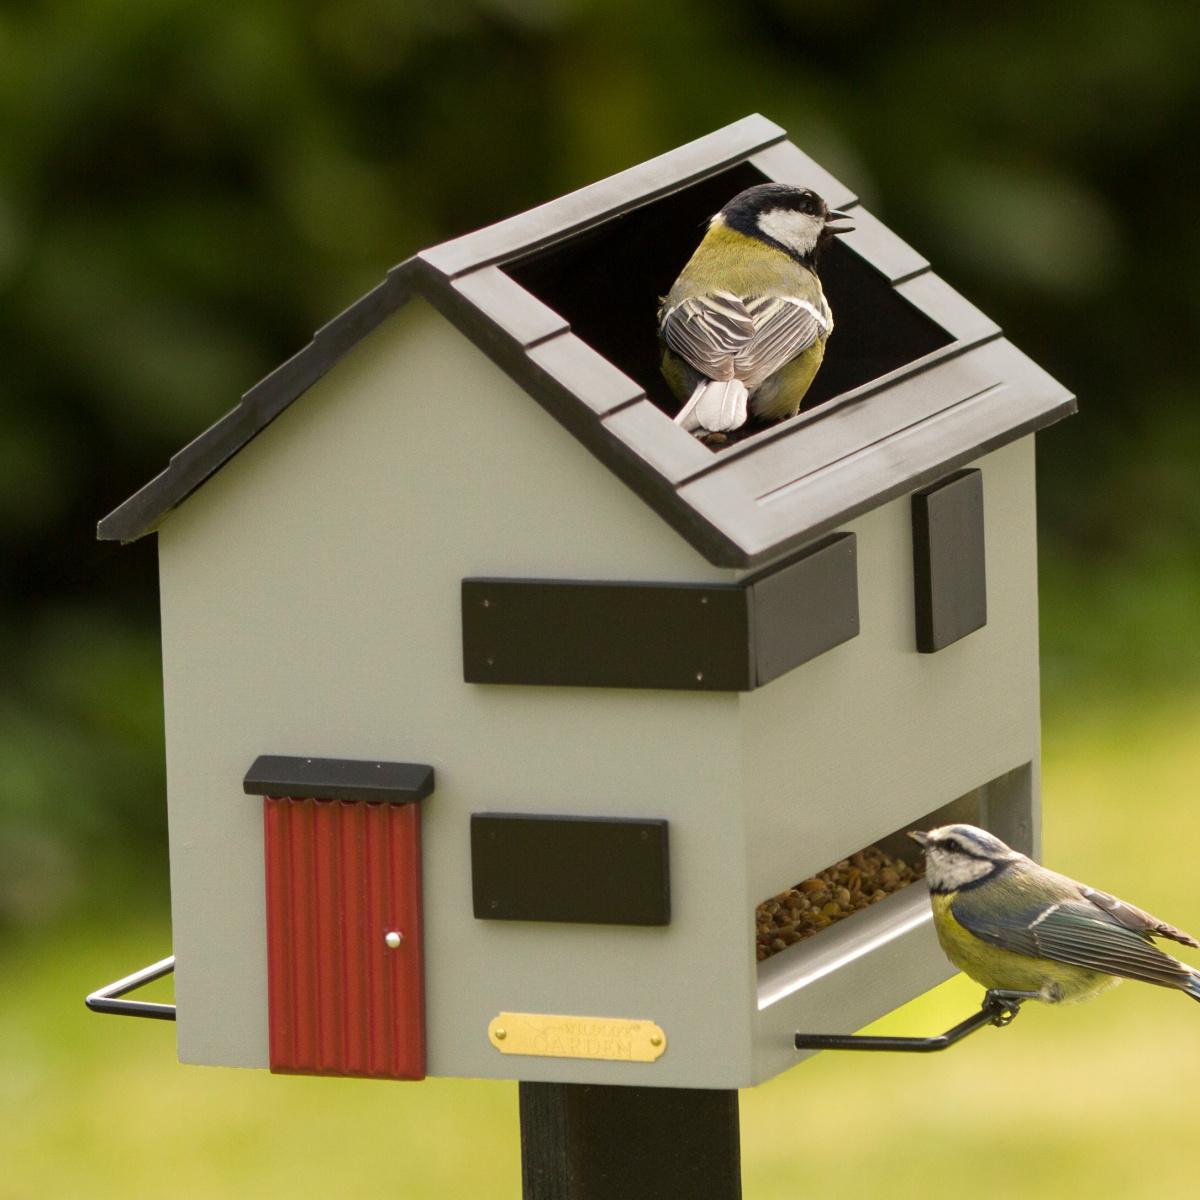 Wildlife Garden foderhus med fuglebad - grå, moderne